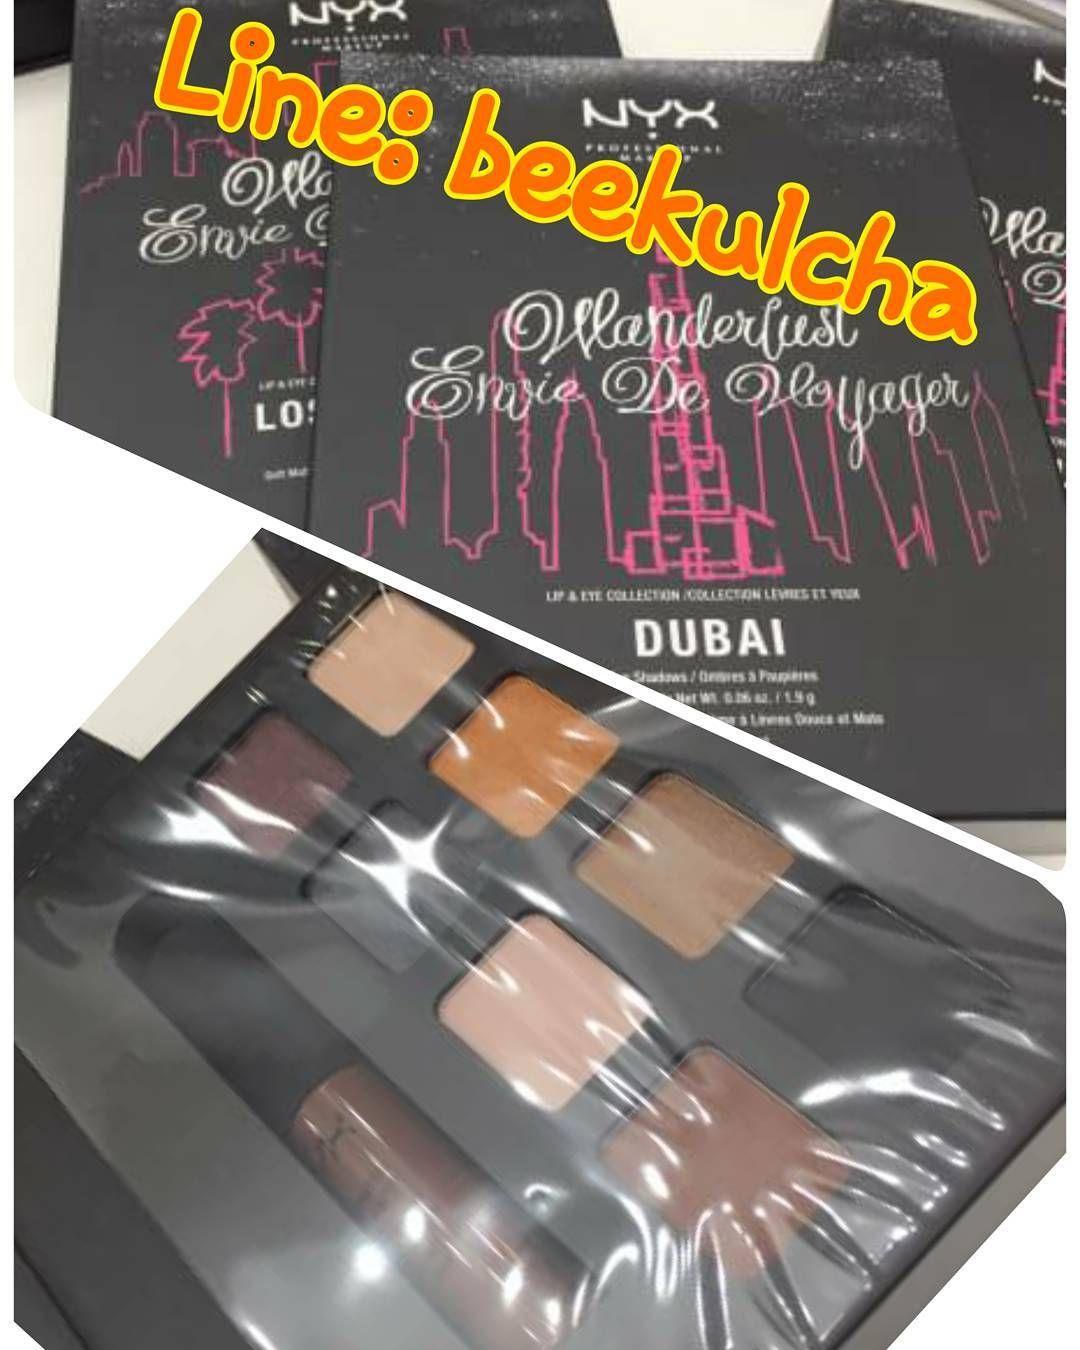 Nyx eye shadows +ลิป Dubai 350.-���� #พร้อมส่ง #cosmetics #jeban #eveandboy #sephorathailand #momaypaplearn #ราคาถูก #รับหิ้ว #ตามหา #macs #maccosmetics #topshopthailand #thailandsale #thailandshopping #milin #salethailand #kwankaosale #vatanika #kloset #tuicap #disaya #senada #sretsis #cosmetic #shopping #skincare  #nyx http://ameritrustshield.com/ipost/1553357922825992960/?code=BWOosz_FPsA